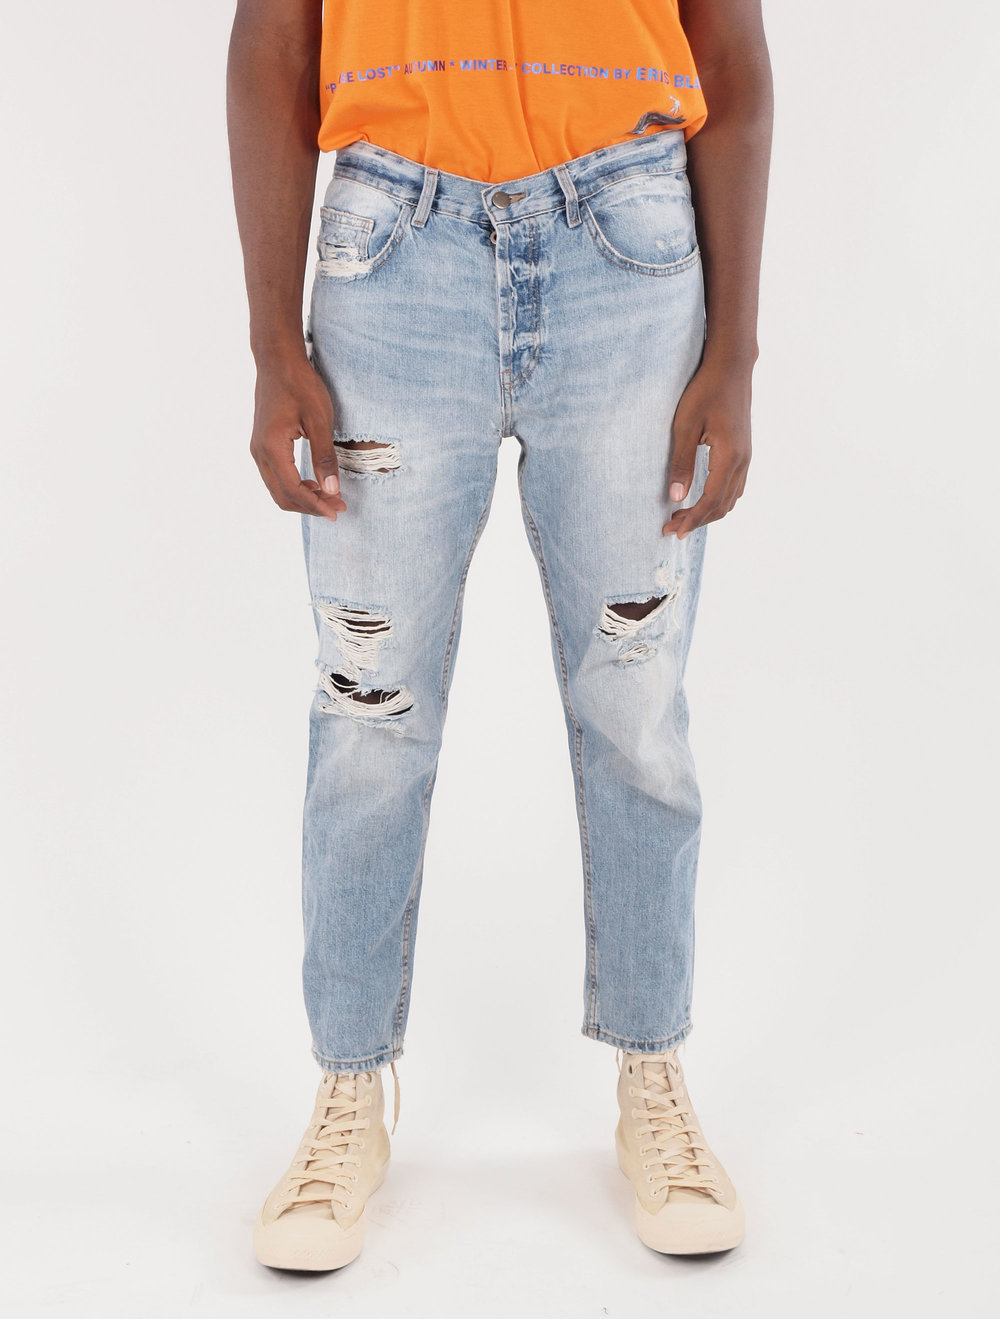 heavy-wash-jeans.jpg